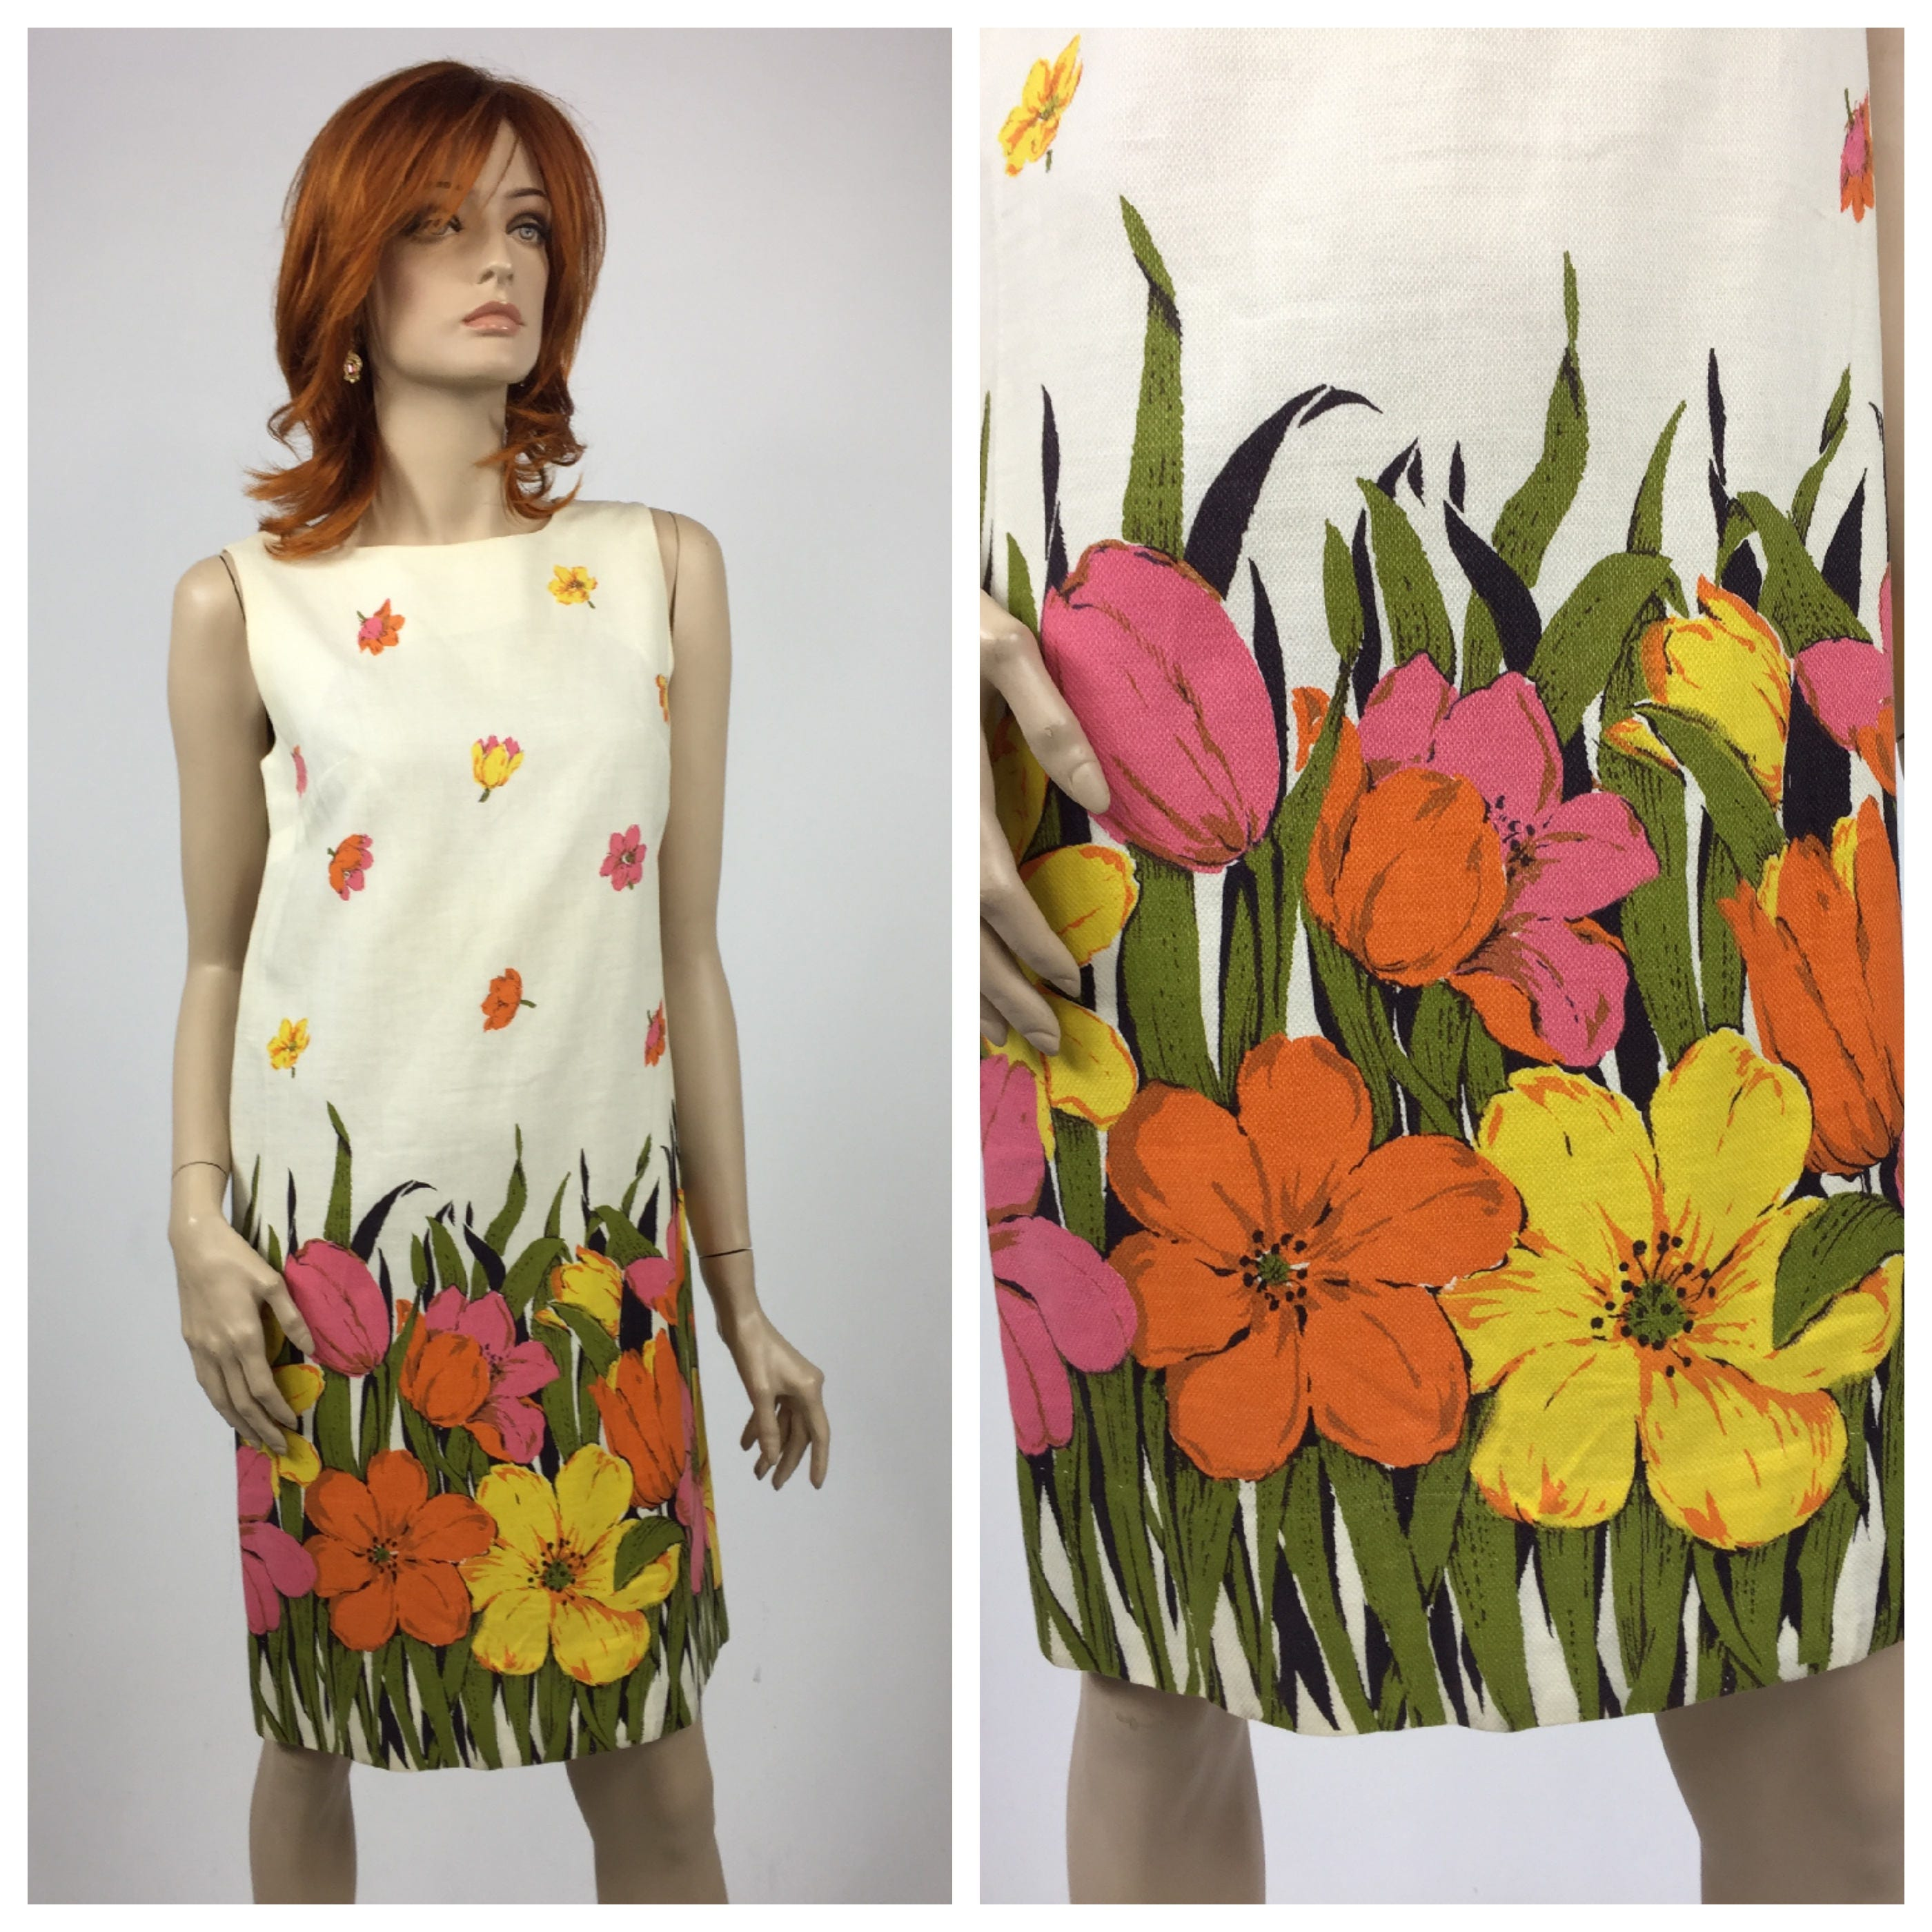 1960 s Border Print Shift Dress   Floral Print Cotton Summer Dress ... bff82249e